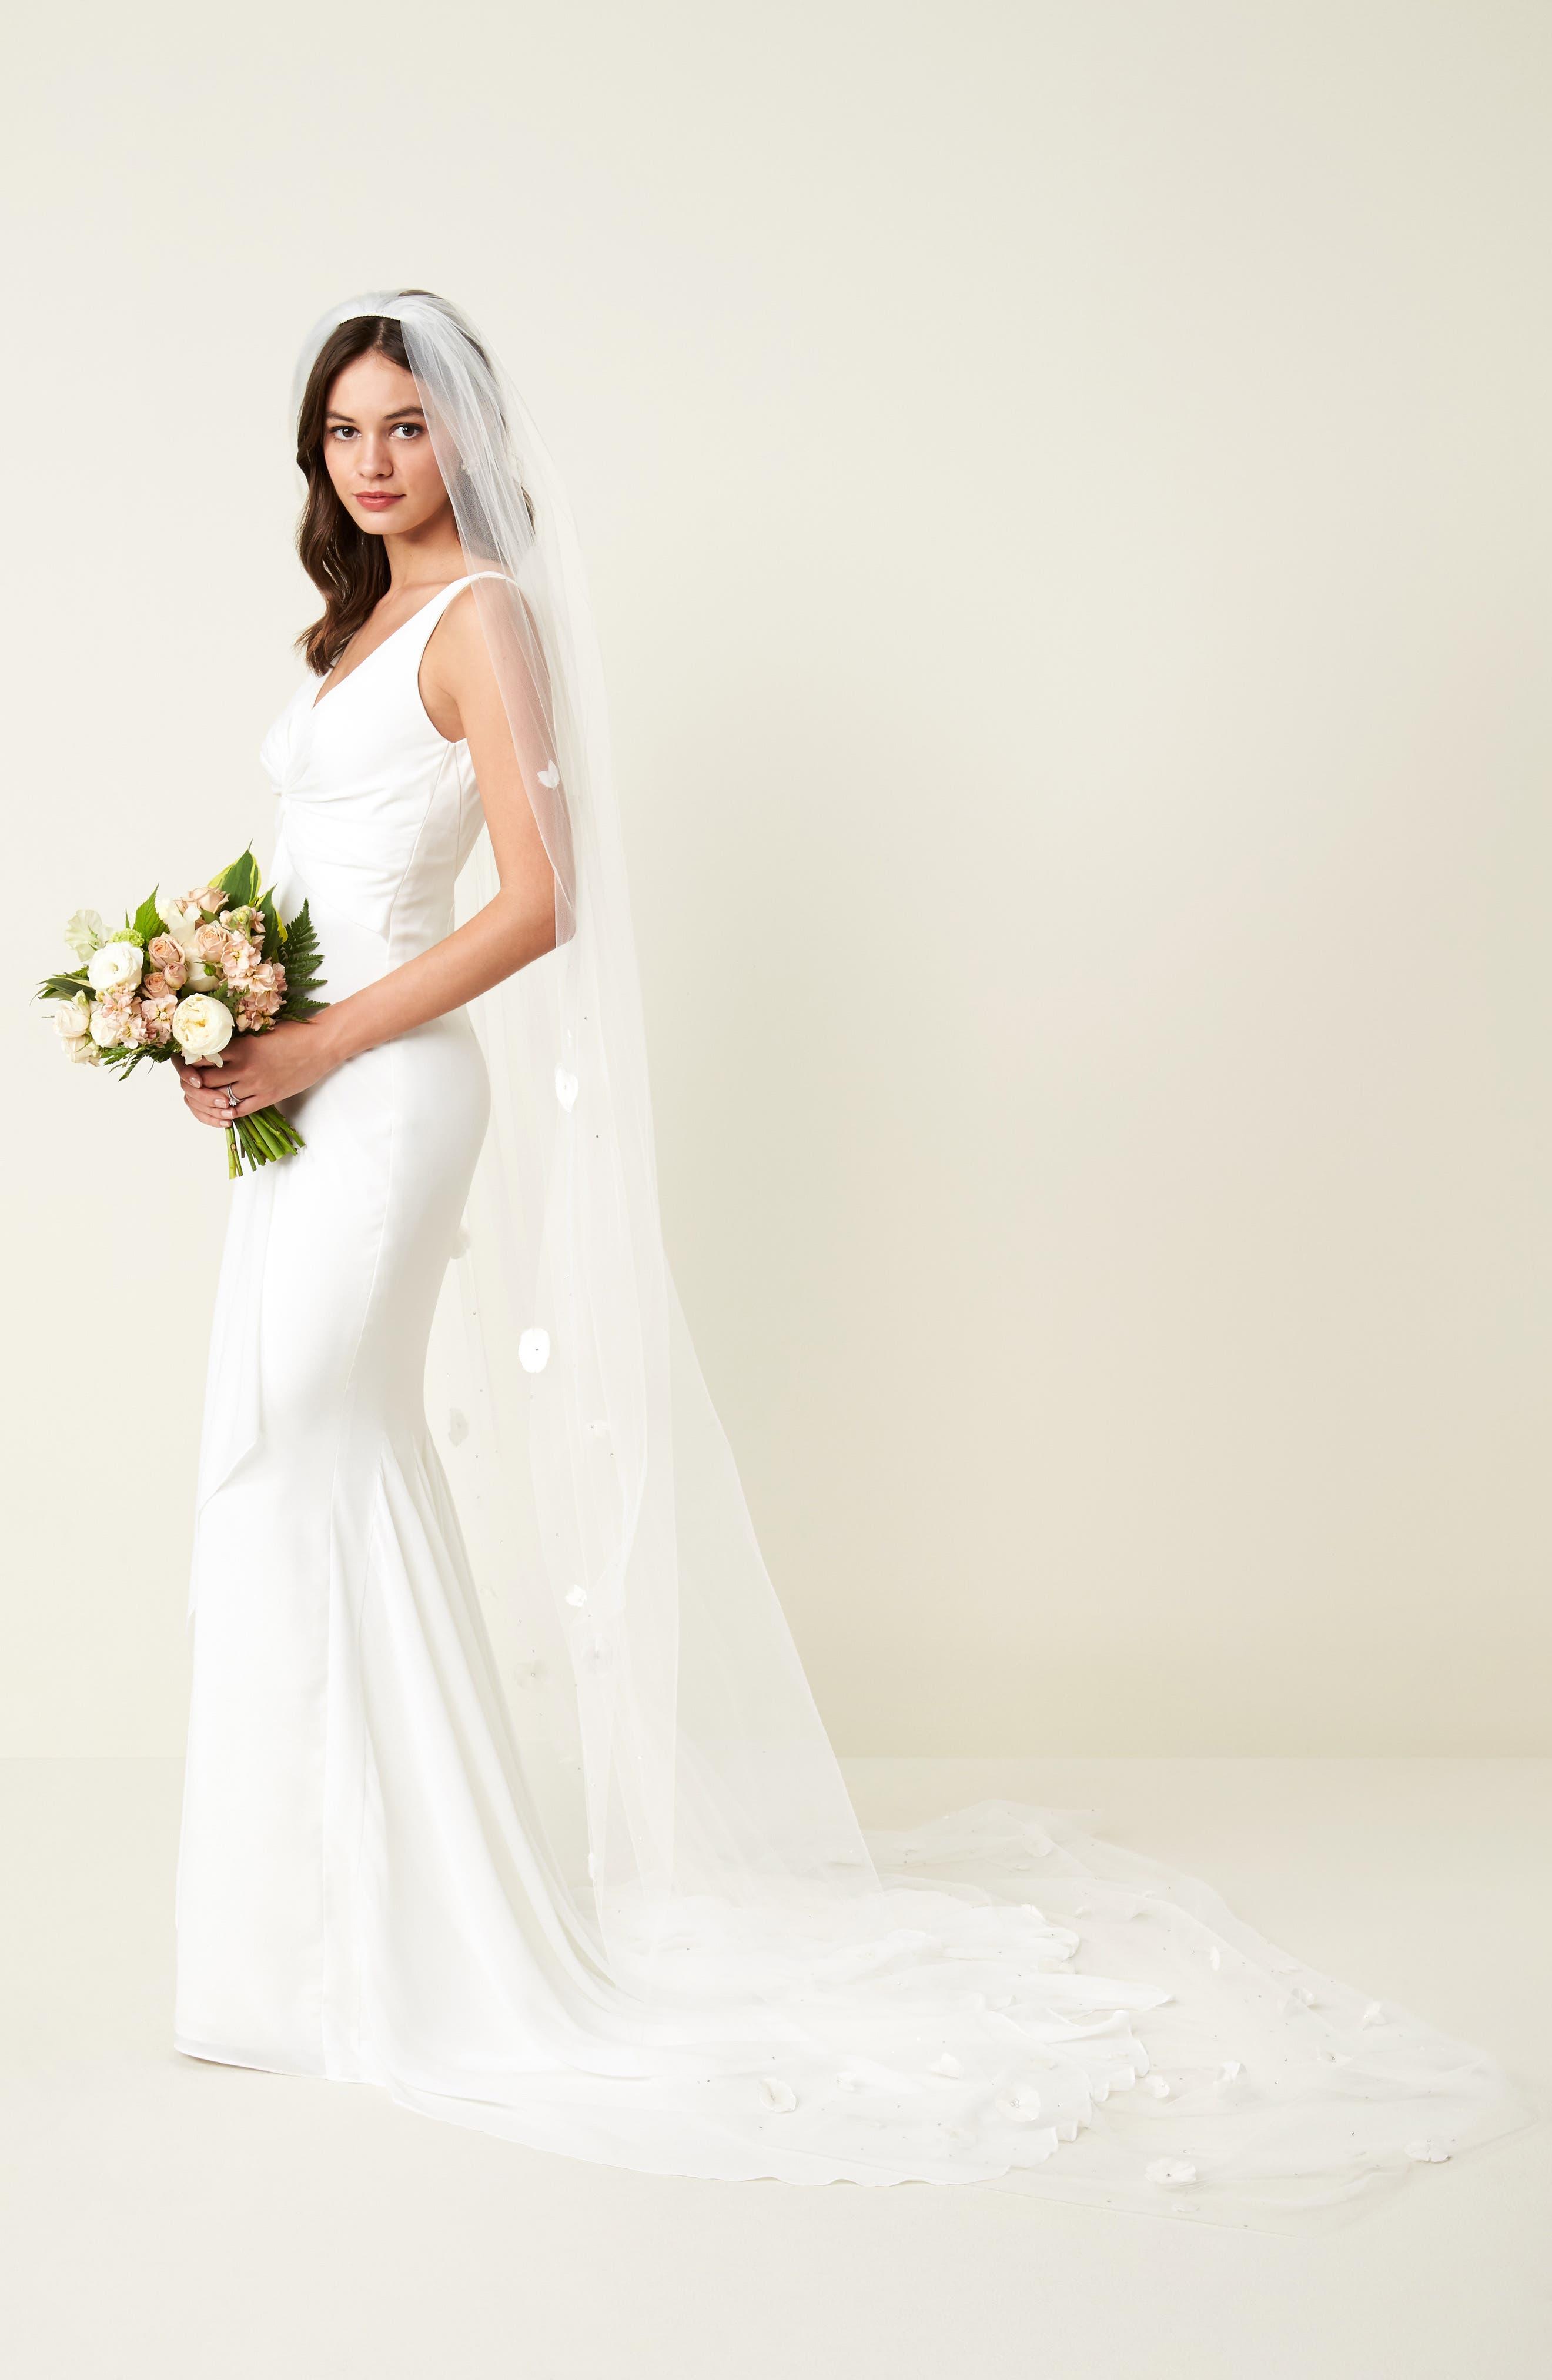 Fleet Embellished Bridal Veil,                             Alternate thumbnail 5, color,                             LIGHT IVORY